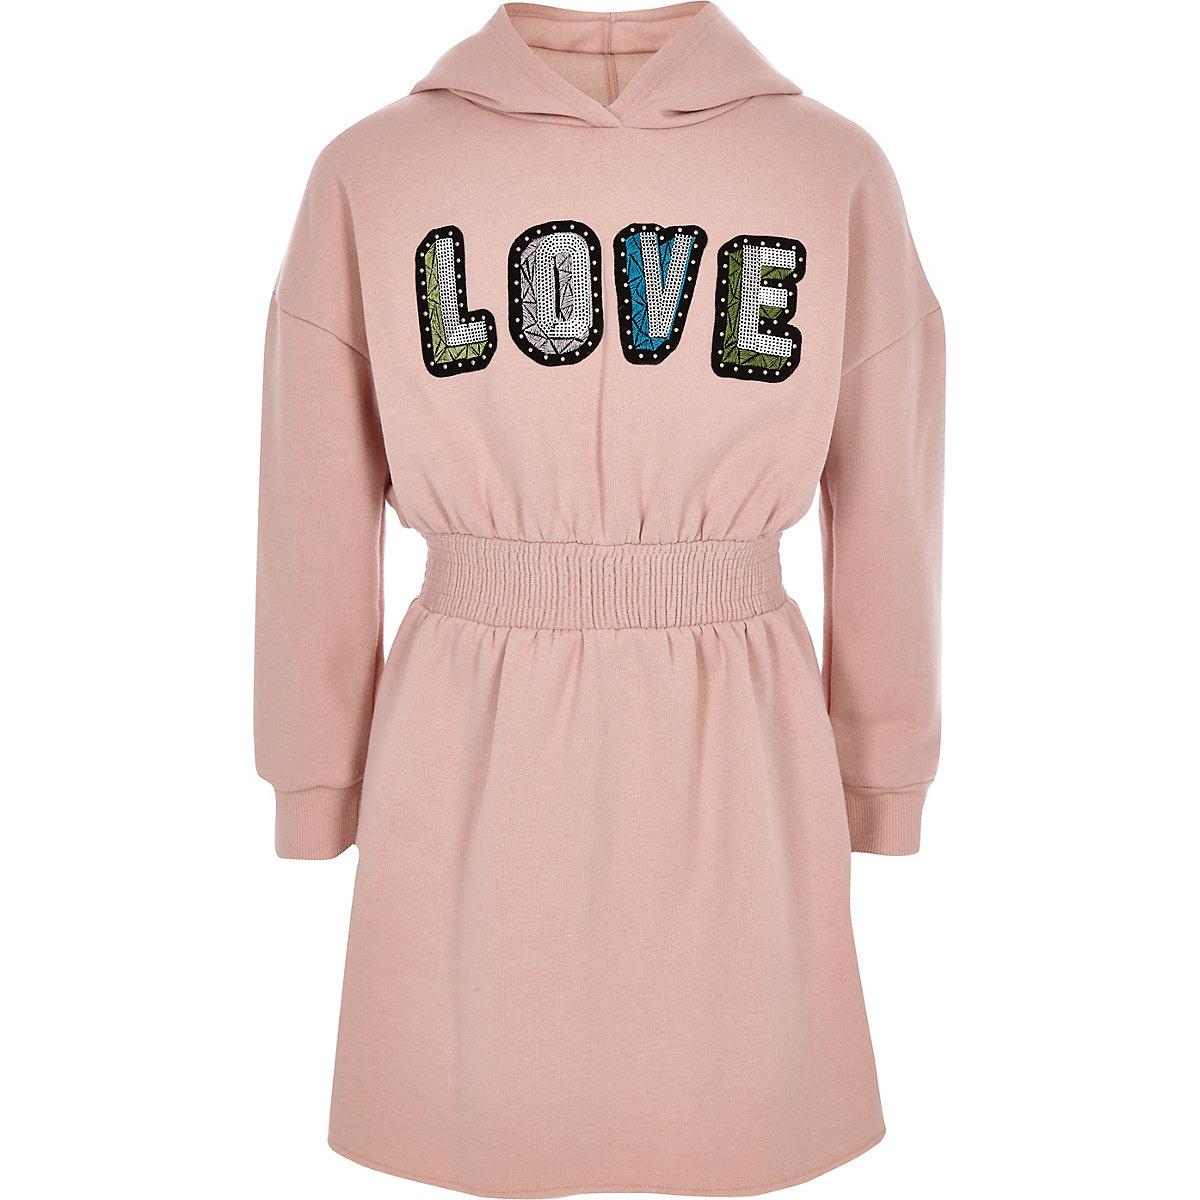 Girls pink 'Love' sweater dress